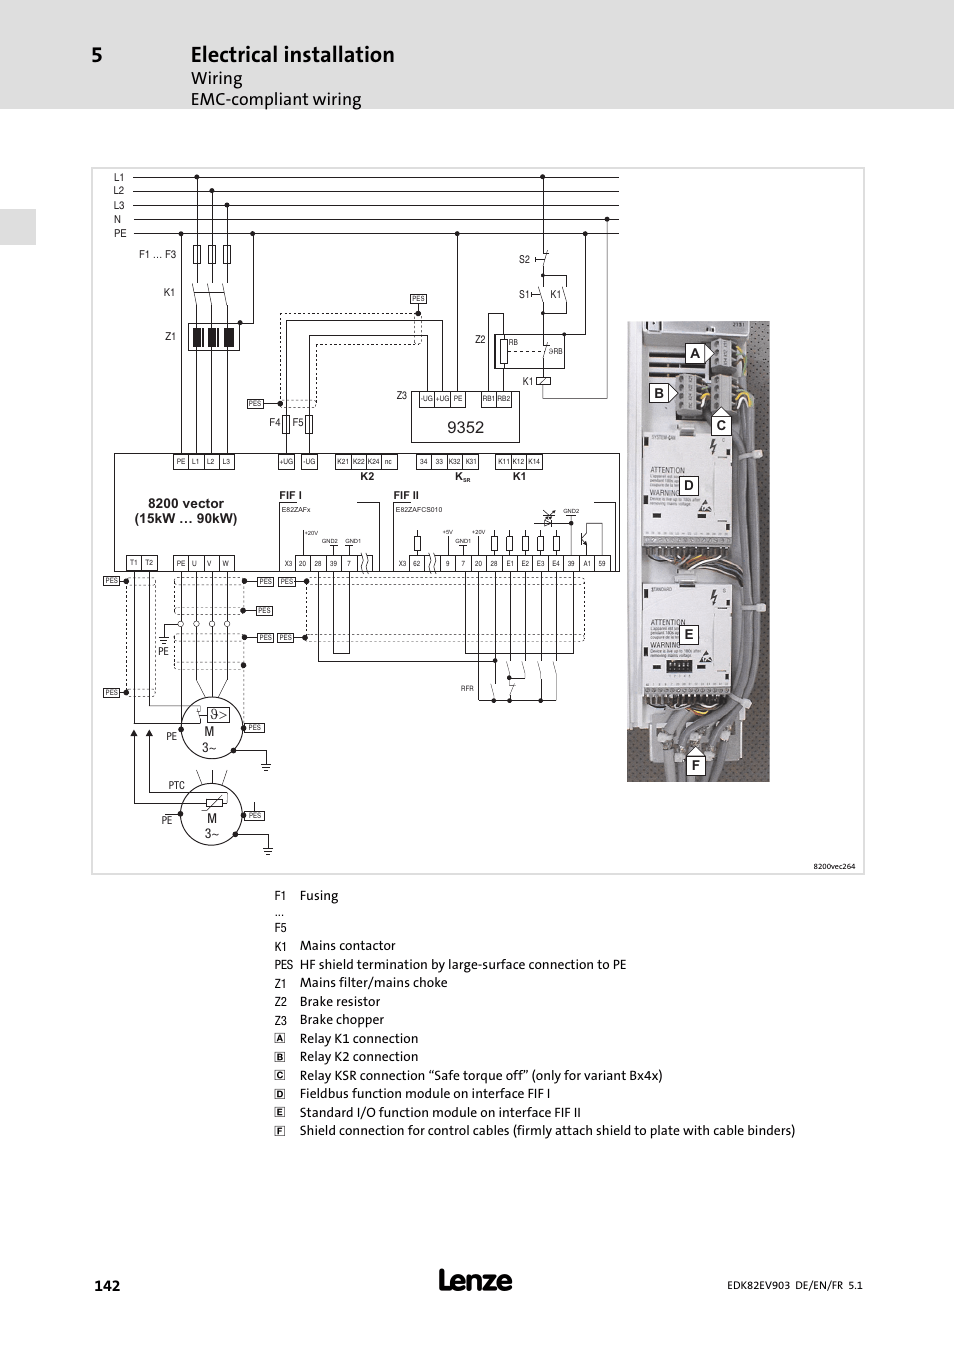 lenze 8200 vector wiring diagram